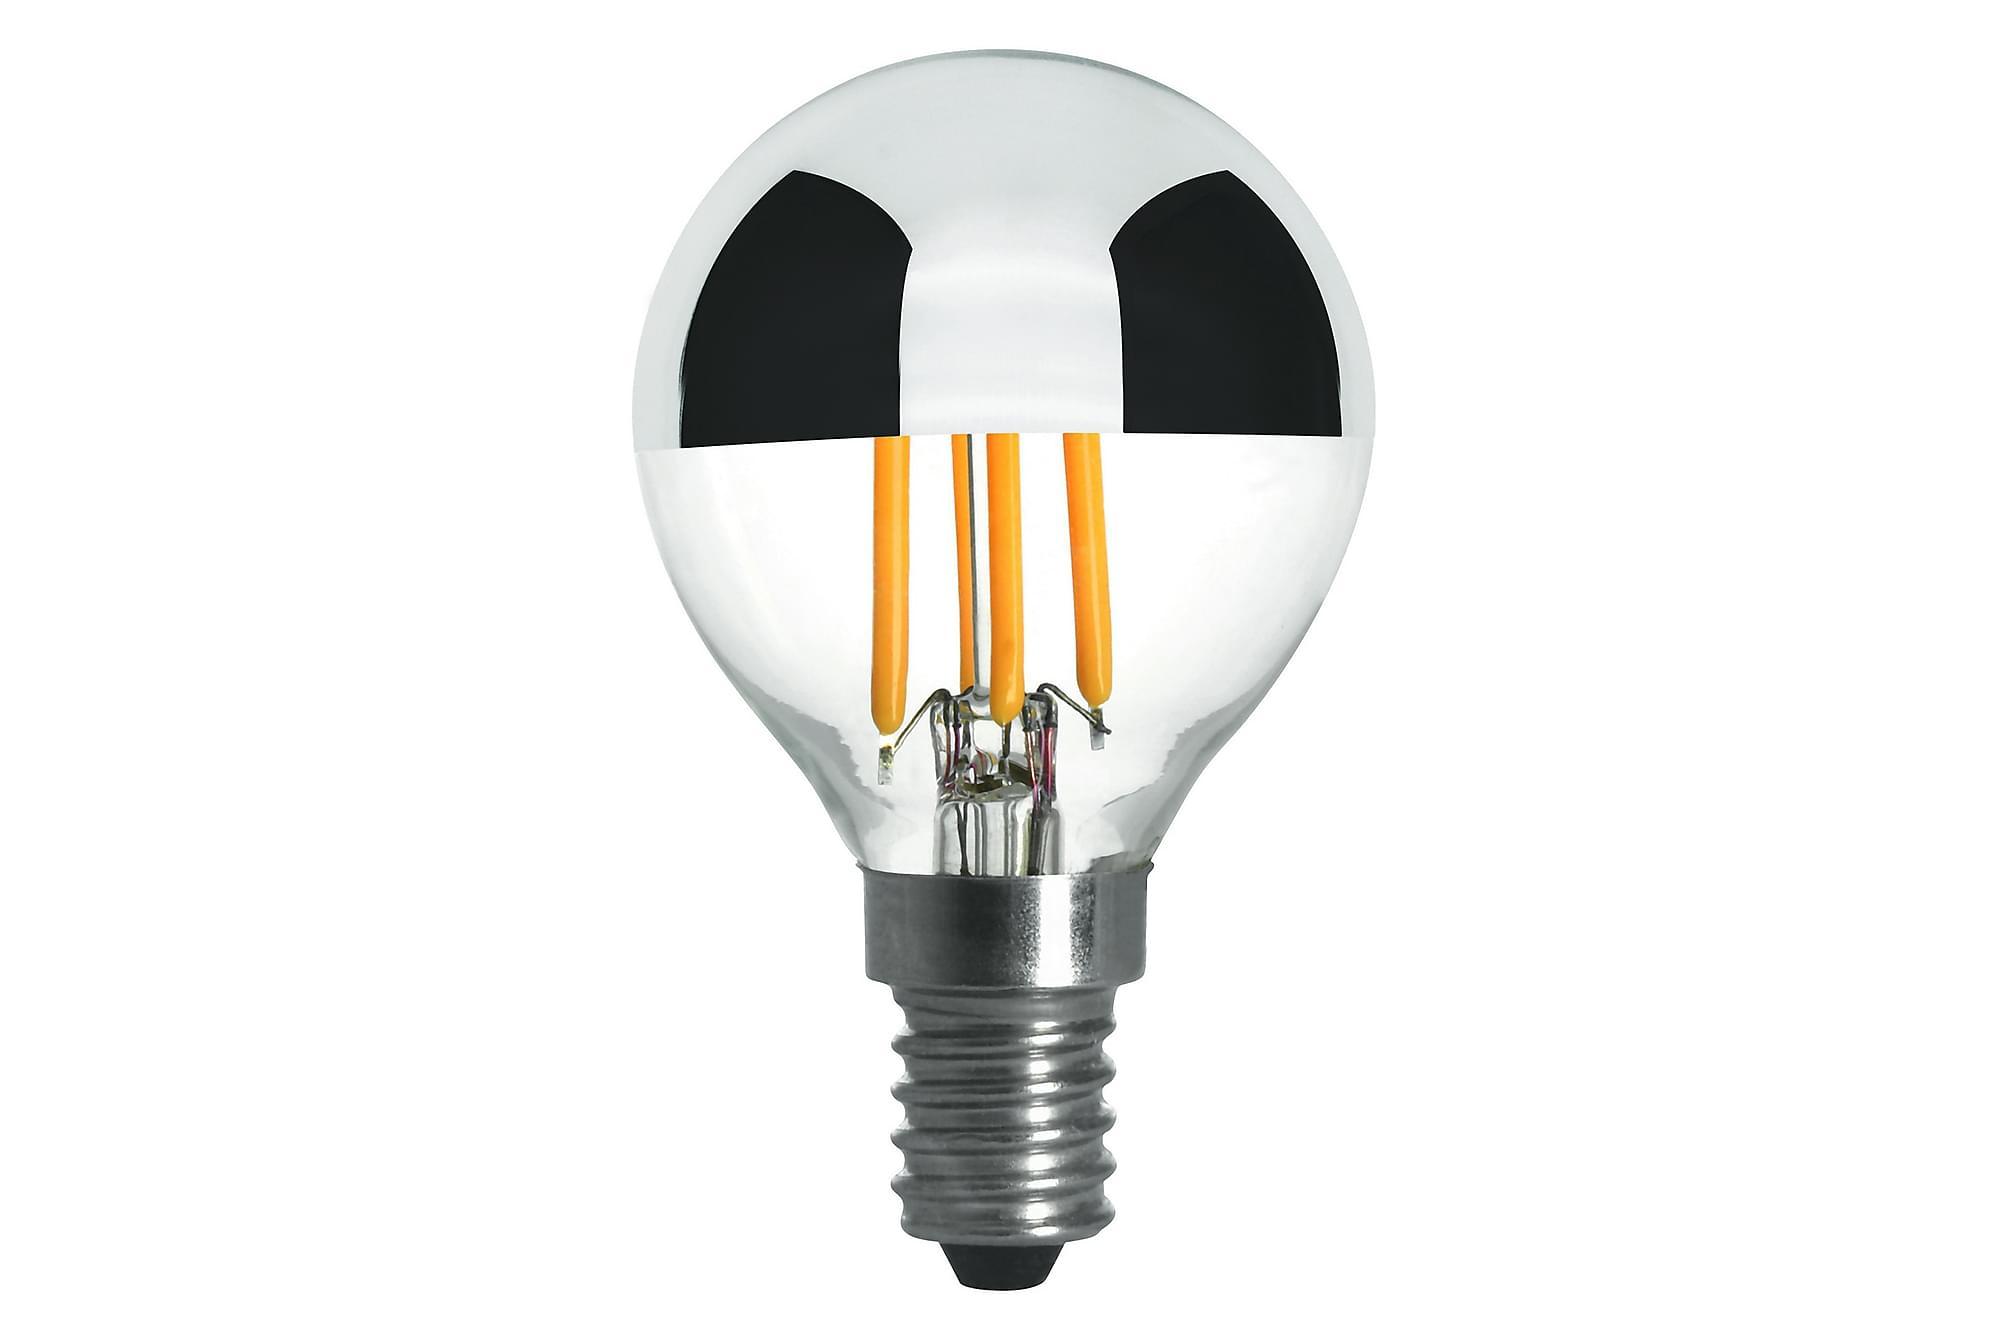 KIBBLE LED-lampa 1,8W E14 2700K Filament, Glödlampor & ljuskällor